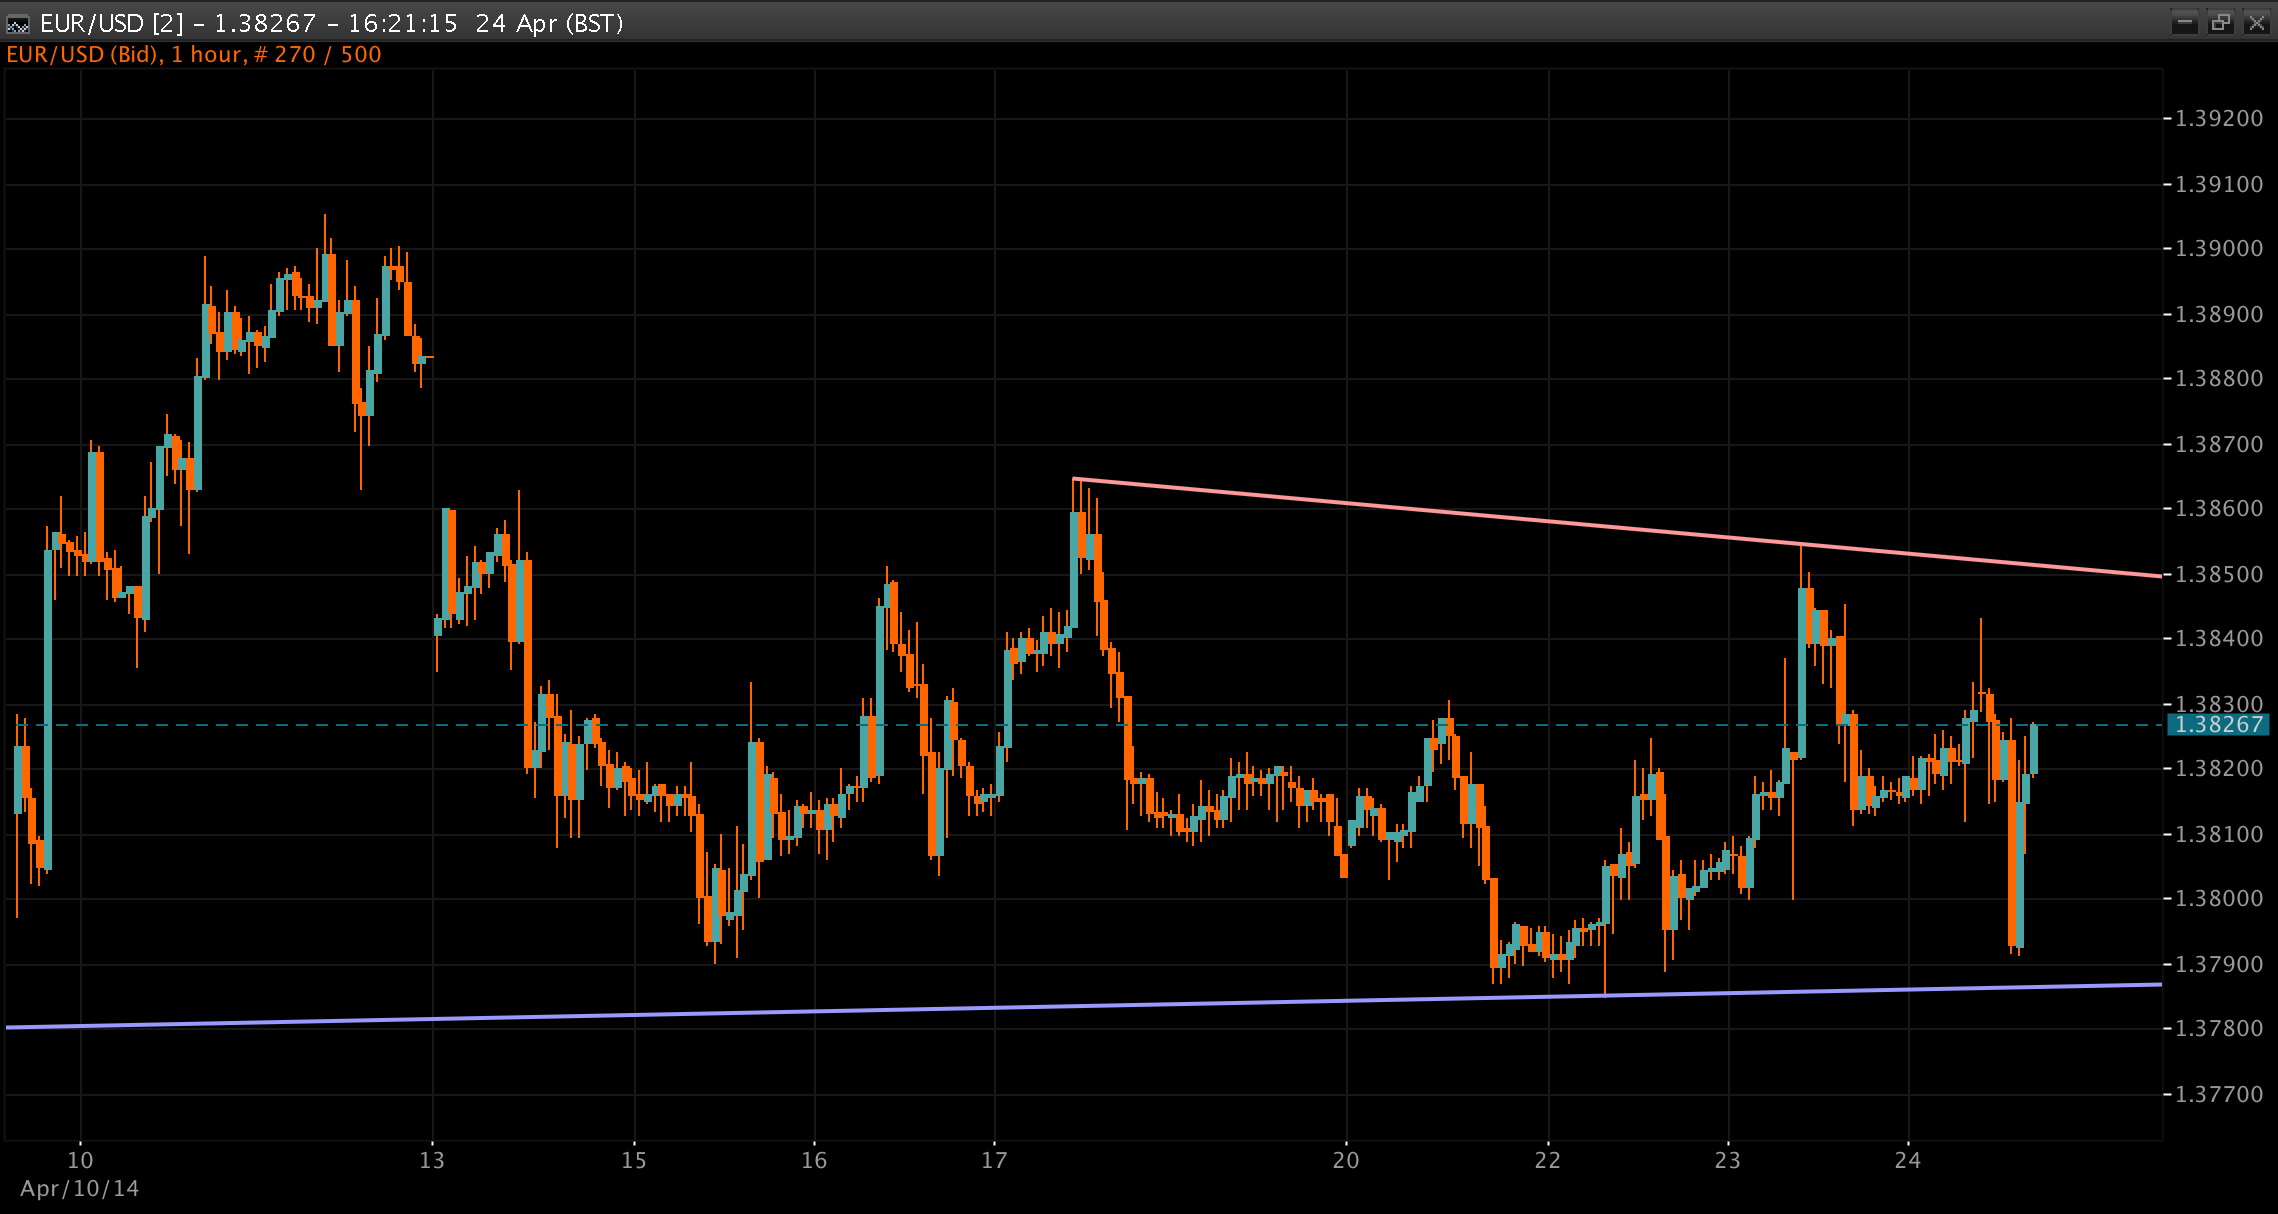 EUR/USD Chart 24 Apr 2014